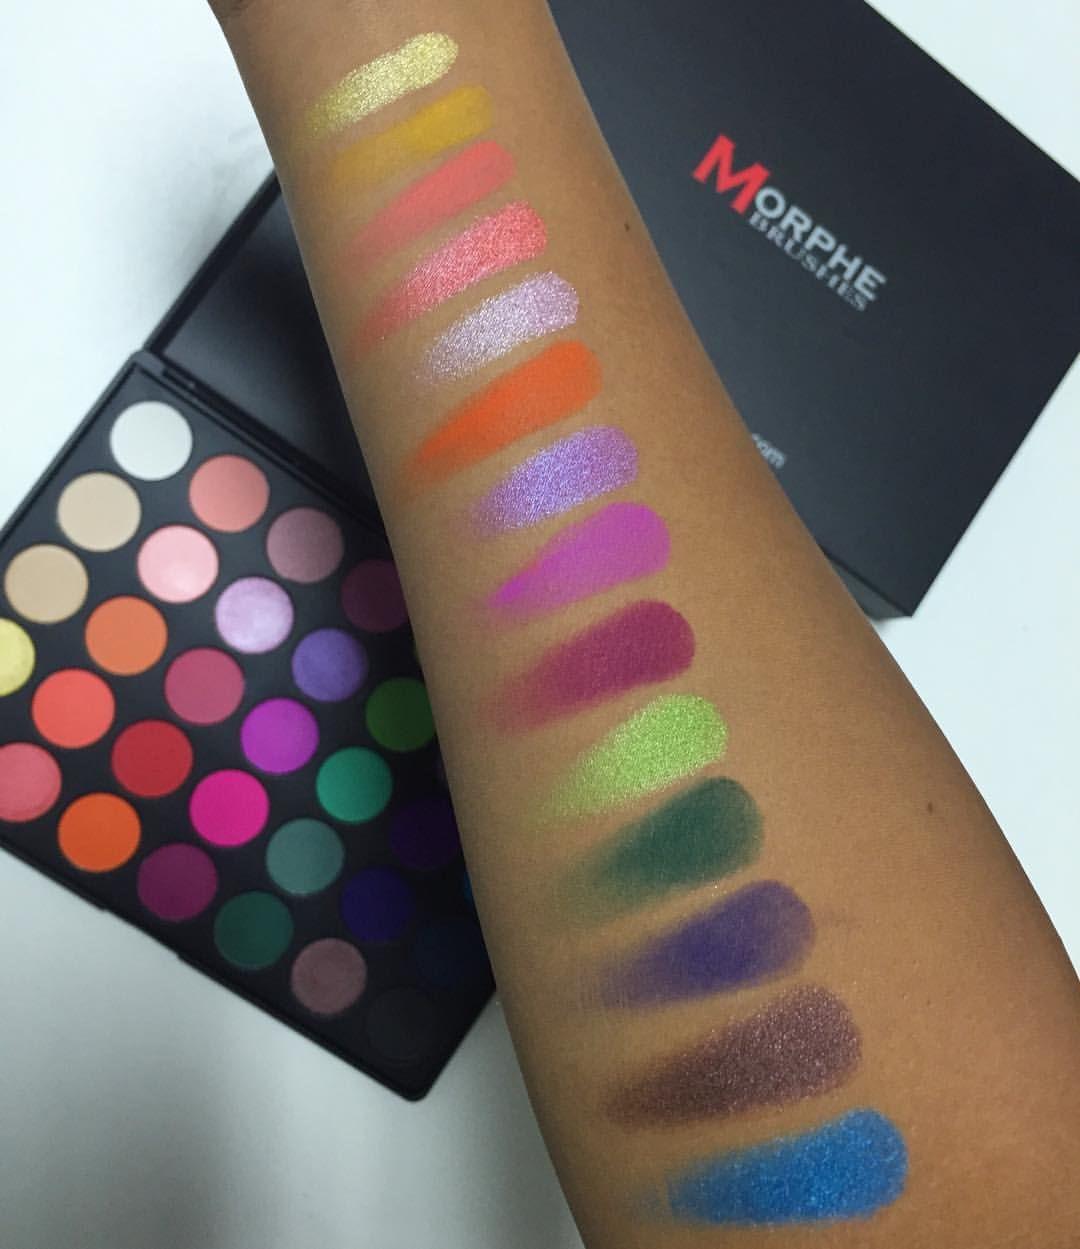 35b Palette Swatches Face Eyes In 2018 Pinterest Wardah Make Up Kit Special Edition Beauty Blender Mac Lipstick Makeup Geek Blusher